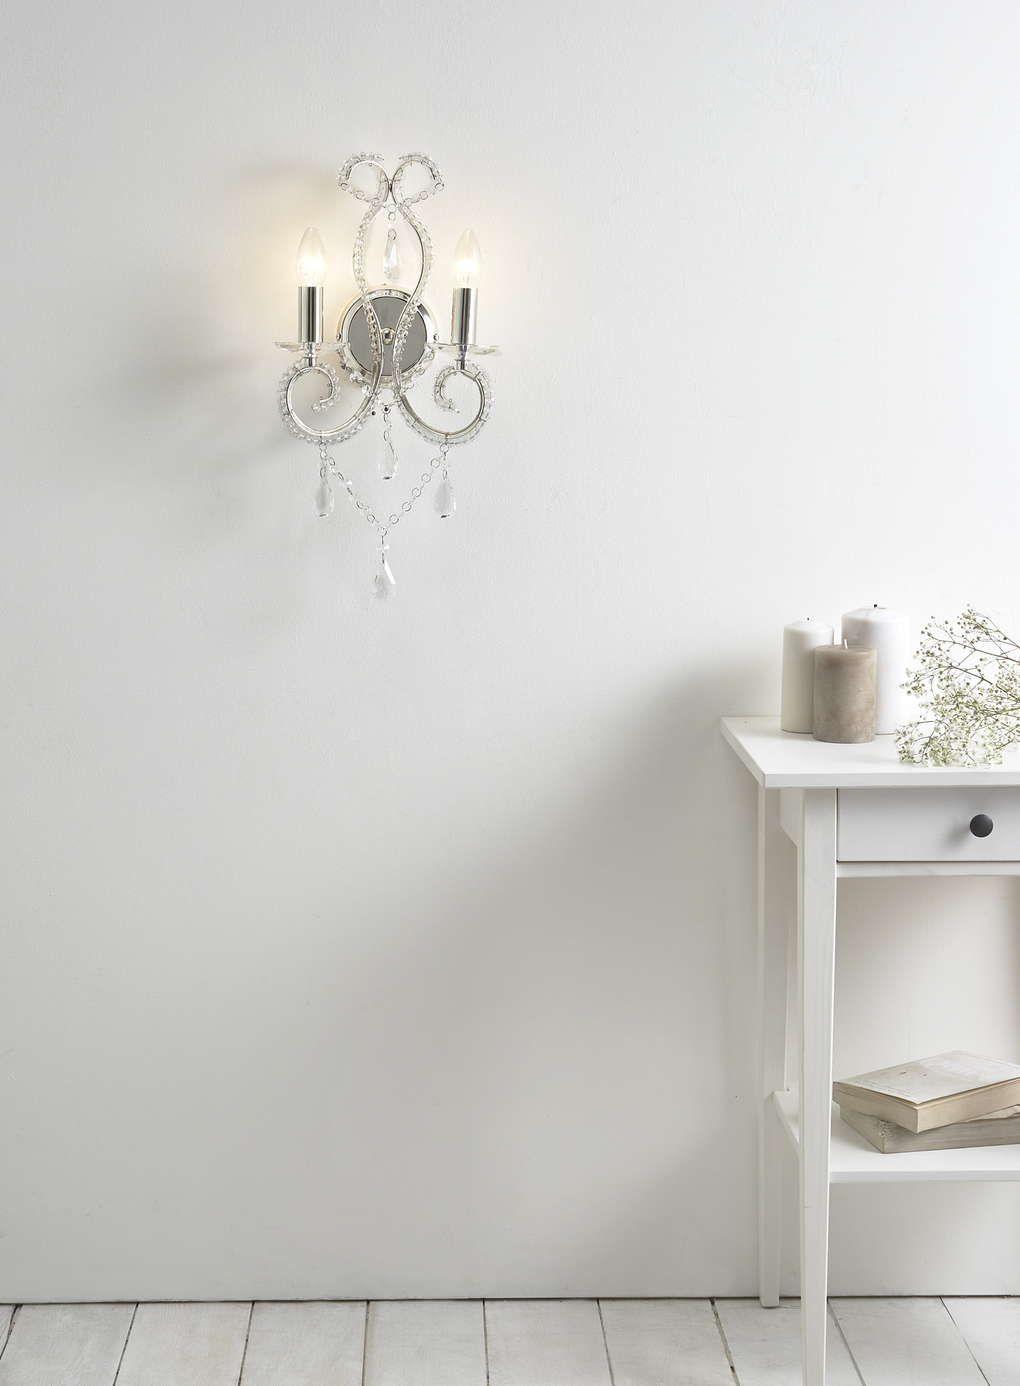 Chrome kelsie wall light bhs master bedroom pinterest bhs chrome kelsie wall light bhs aloadofball Gallery